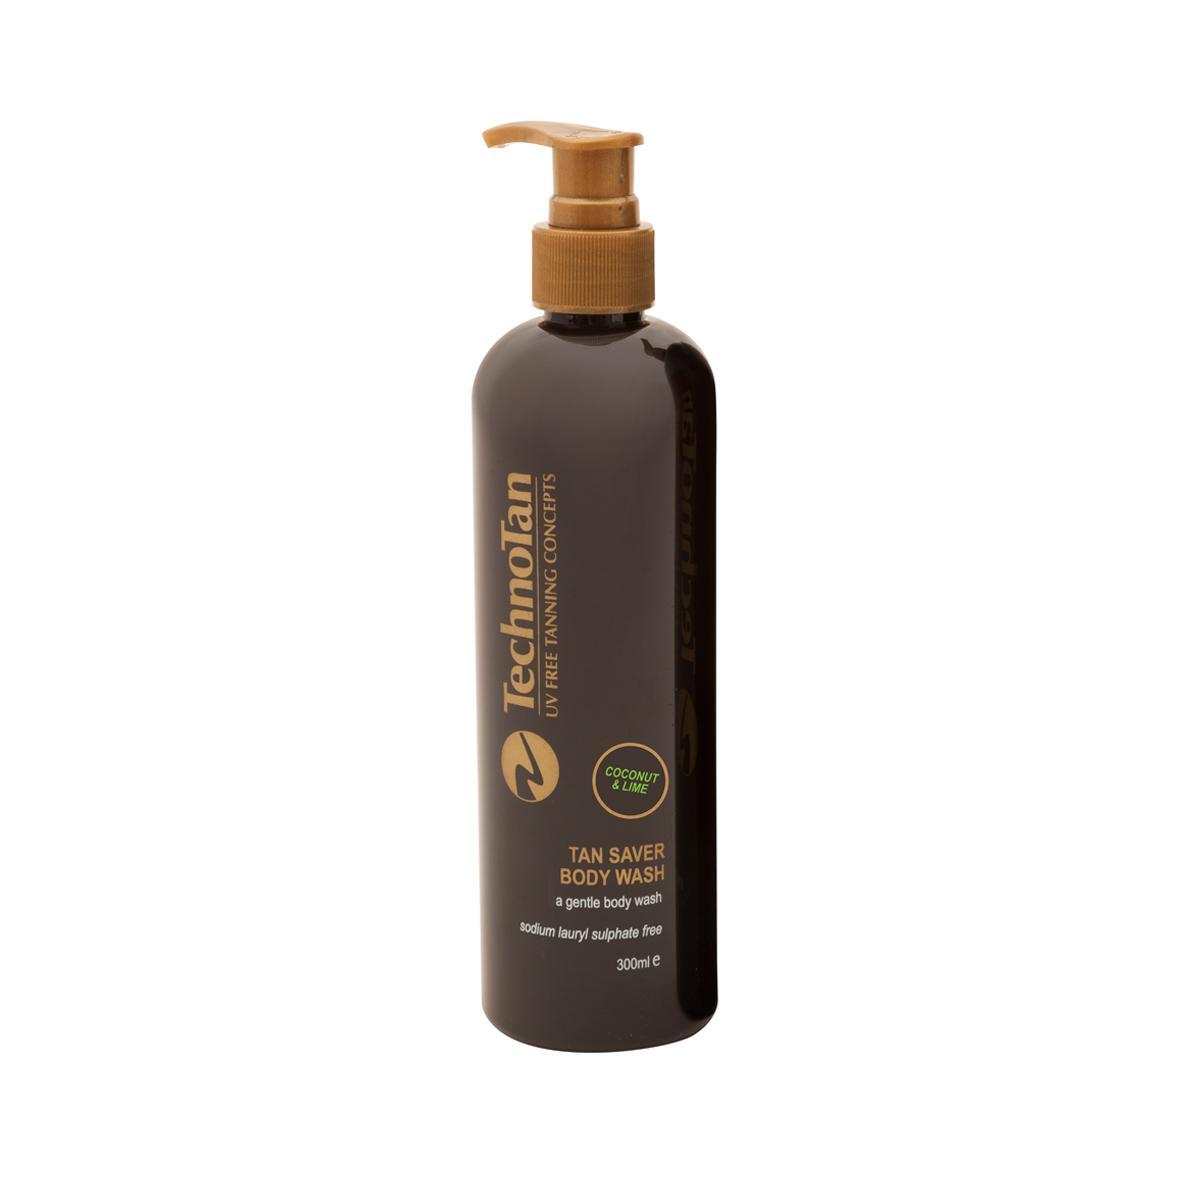 Tan Saver Body Wash — Coconut & Lime — 300ml (pump bottle)